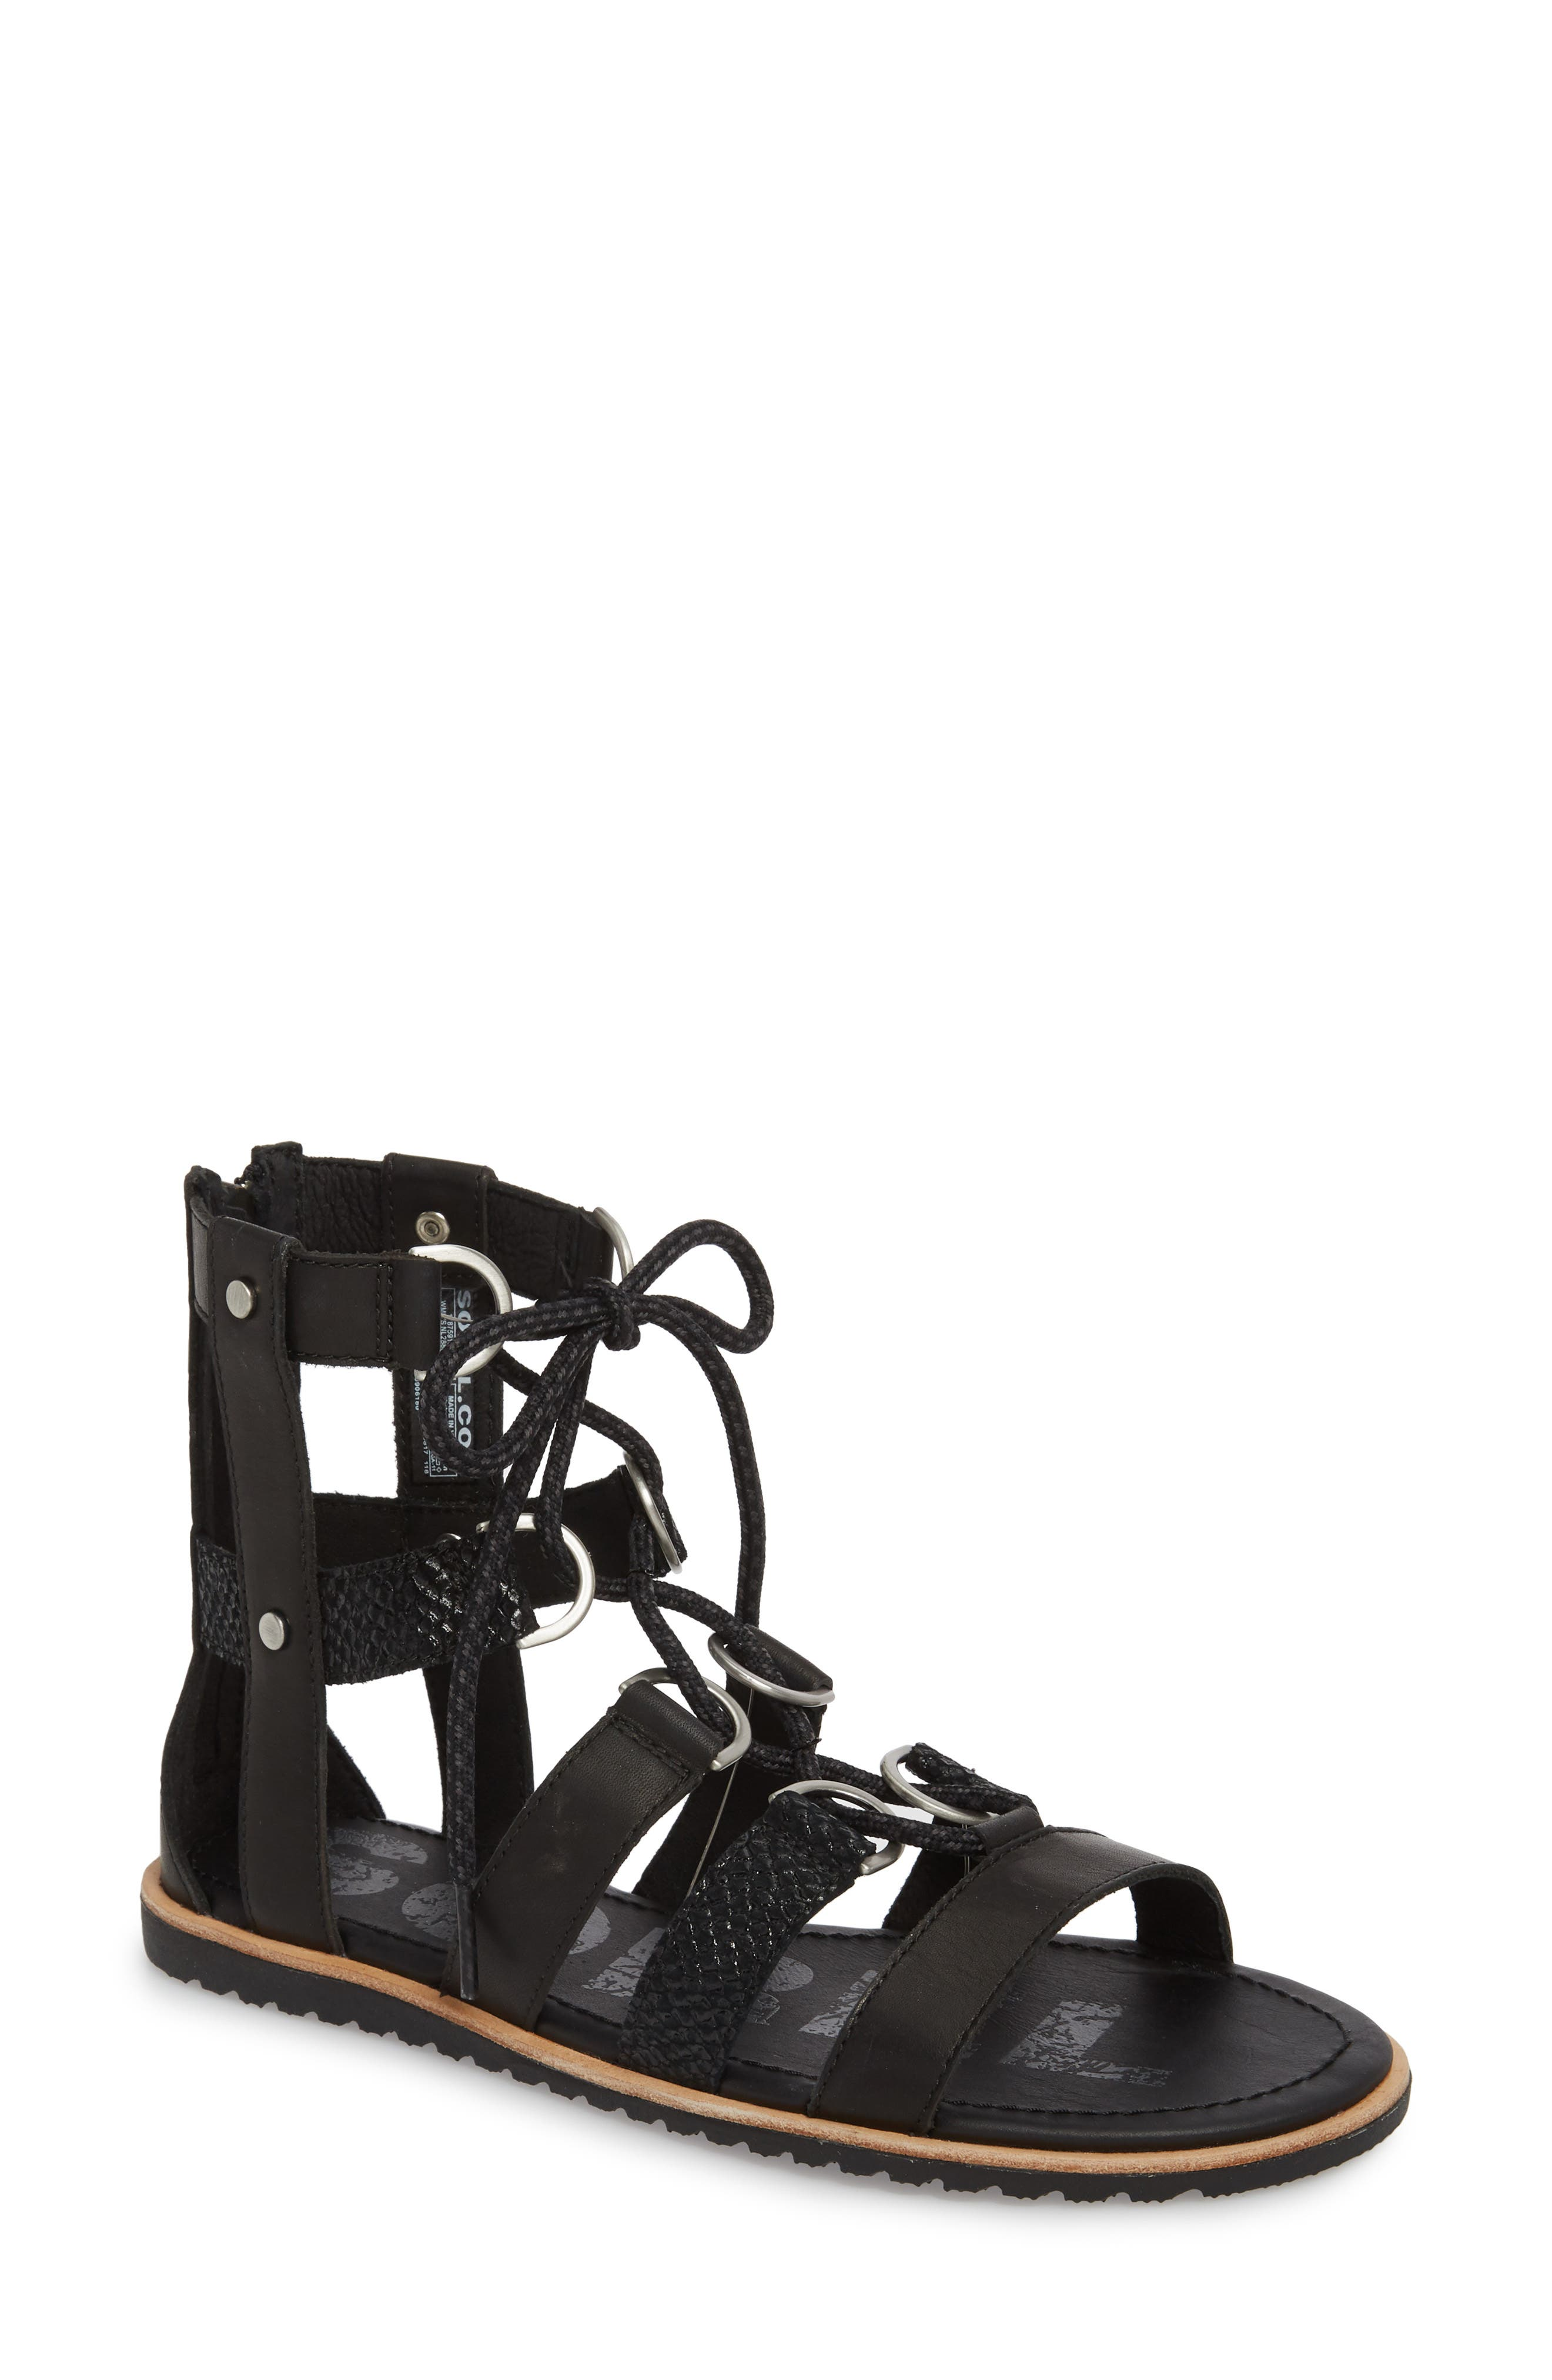 Ella Gladiator Sandal,                         Main,                         color, Black